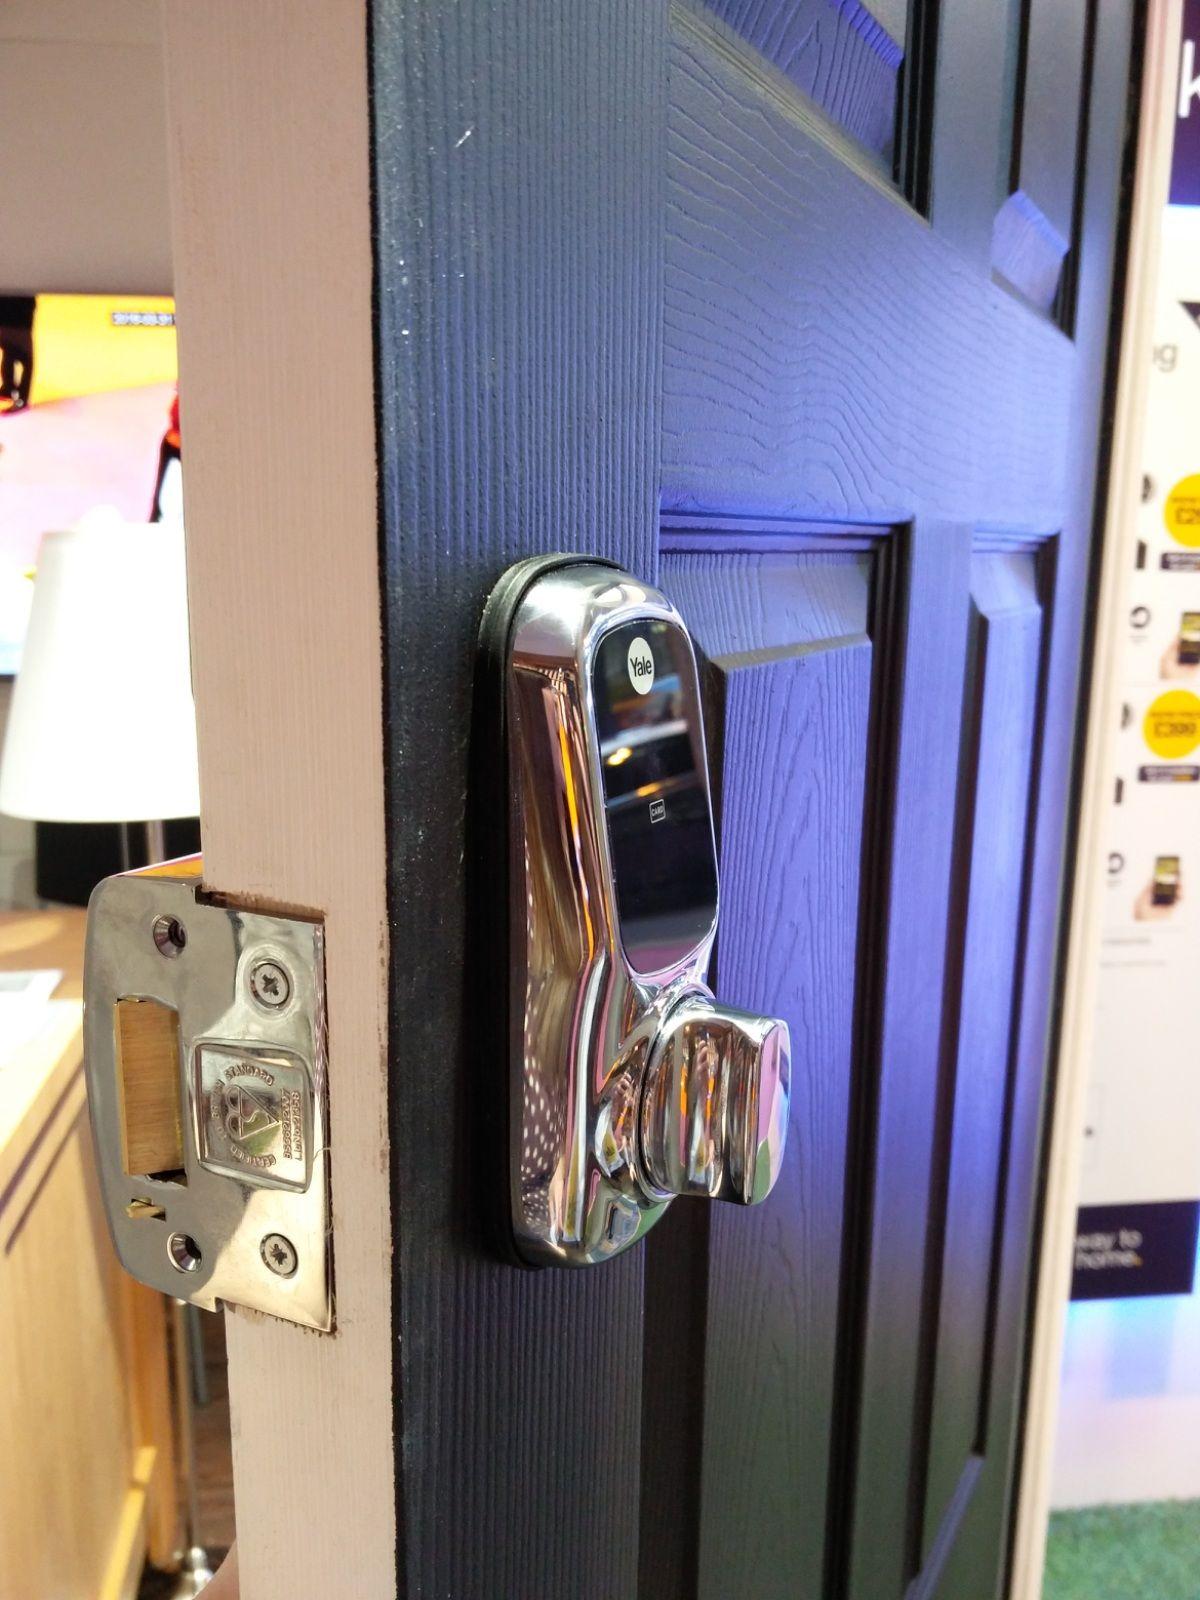 Yale Keyless Connected Smart Lock Locksmith Services Smart Lock